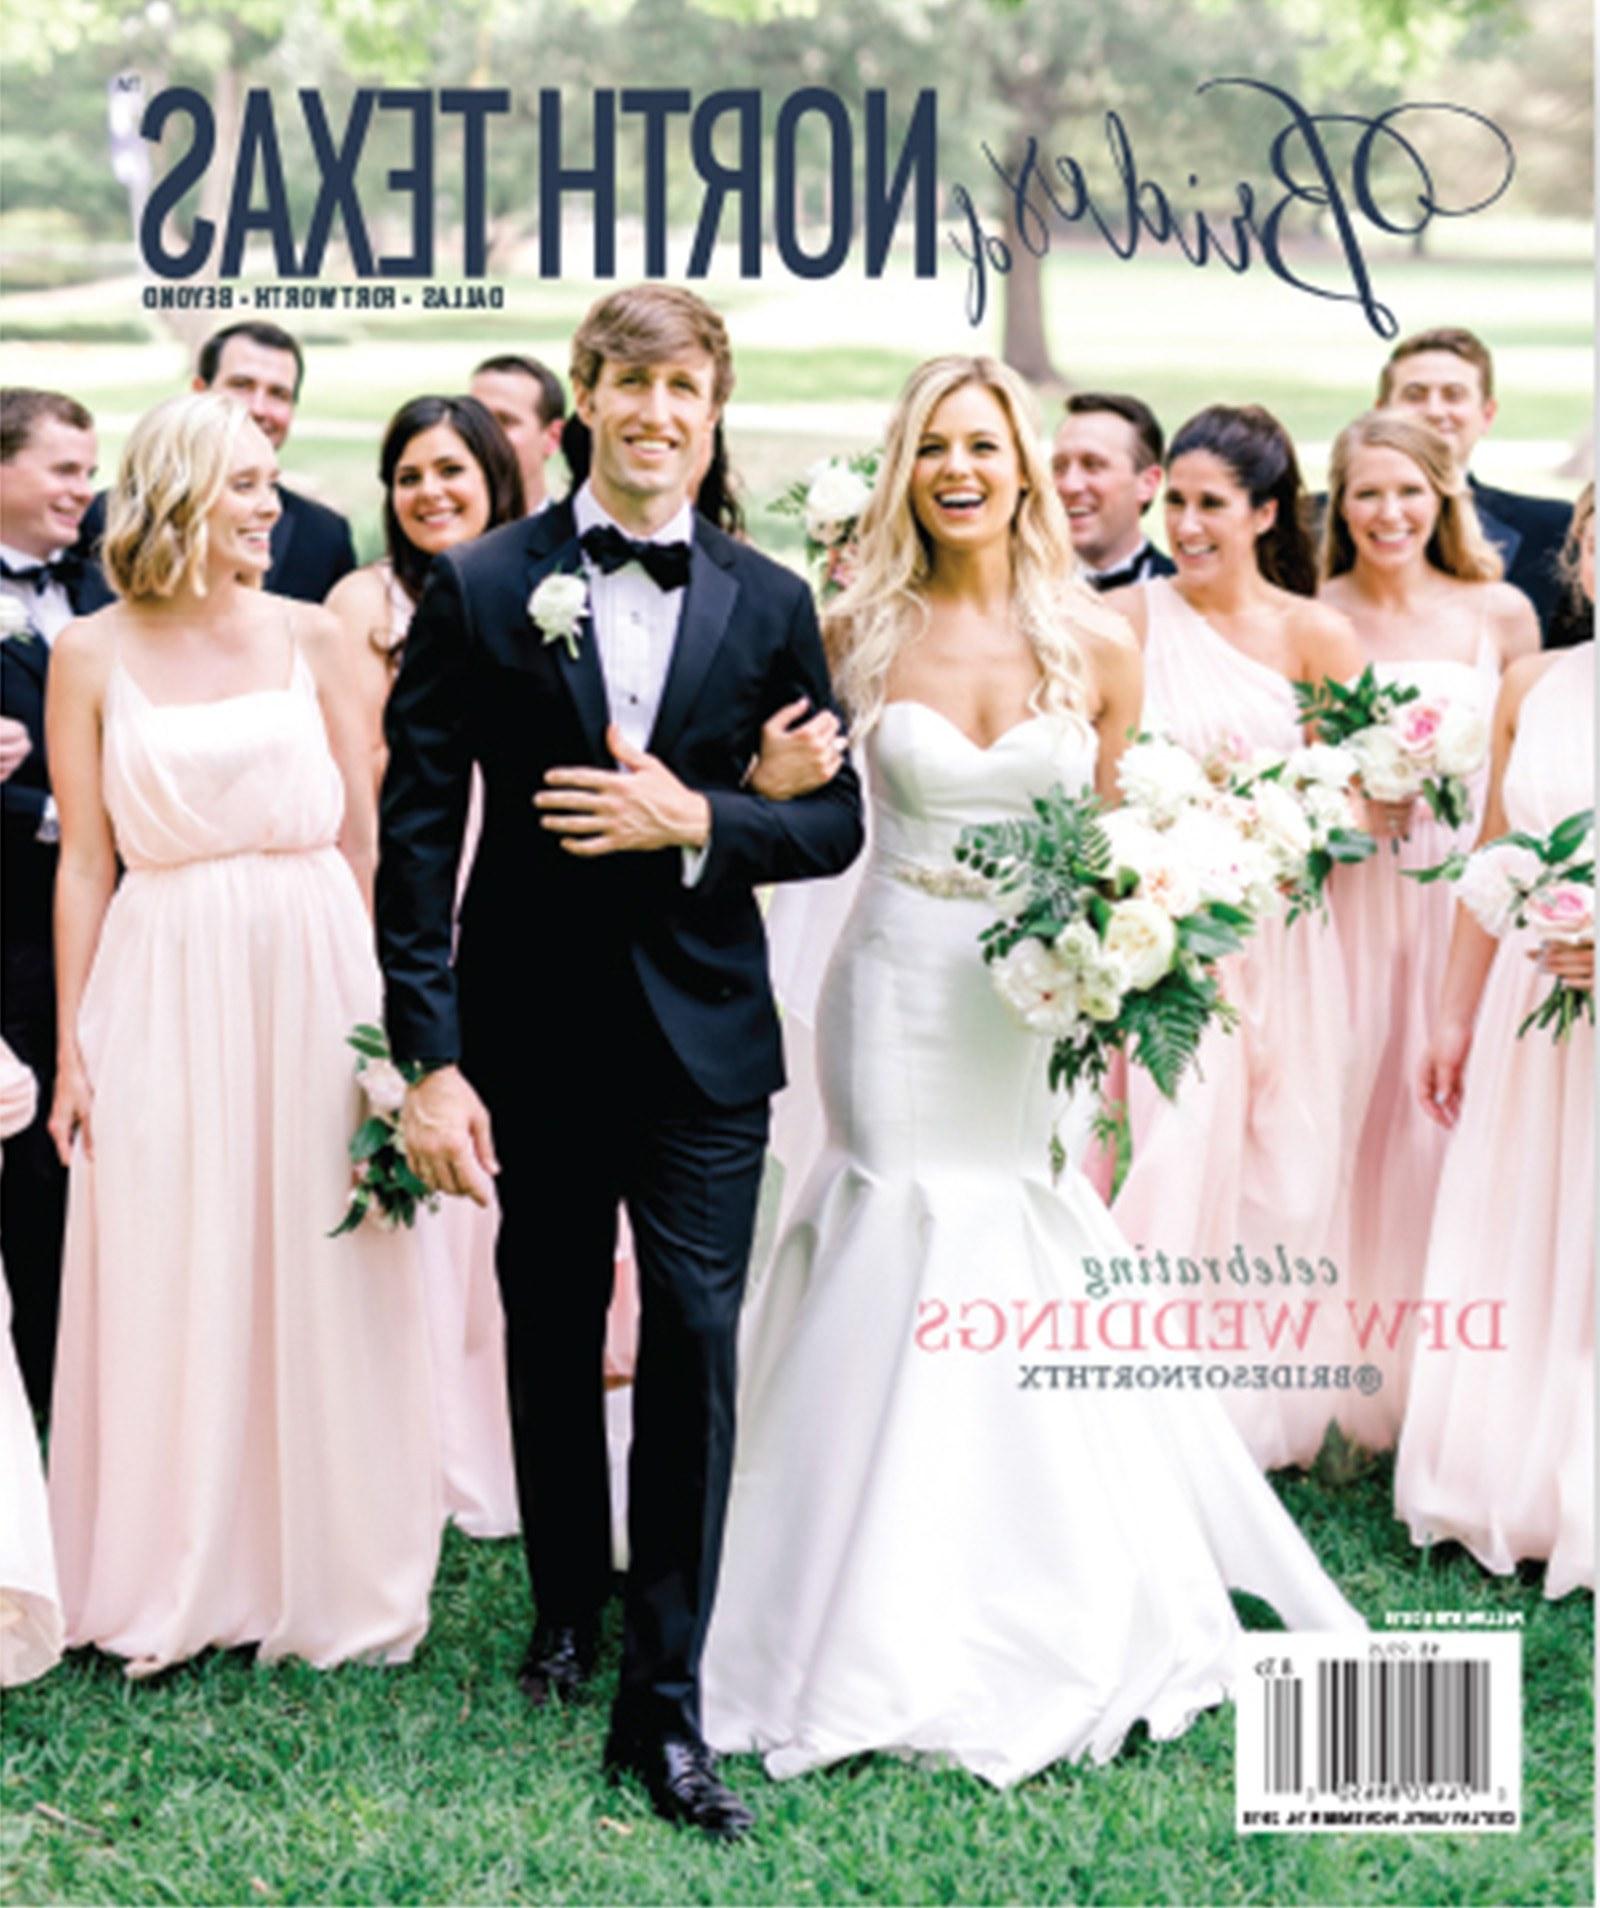 Design Gaun Pengantin Muslimah Warna Hijau Ftd8 Real Weddings Featured In Brides Of north Texas